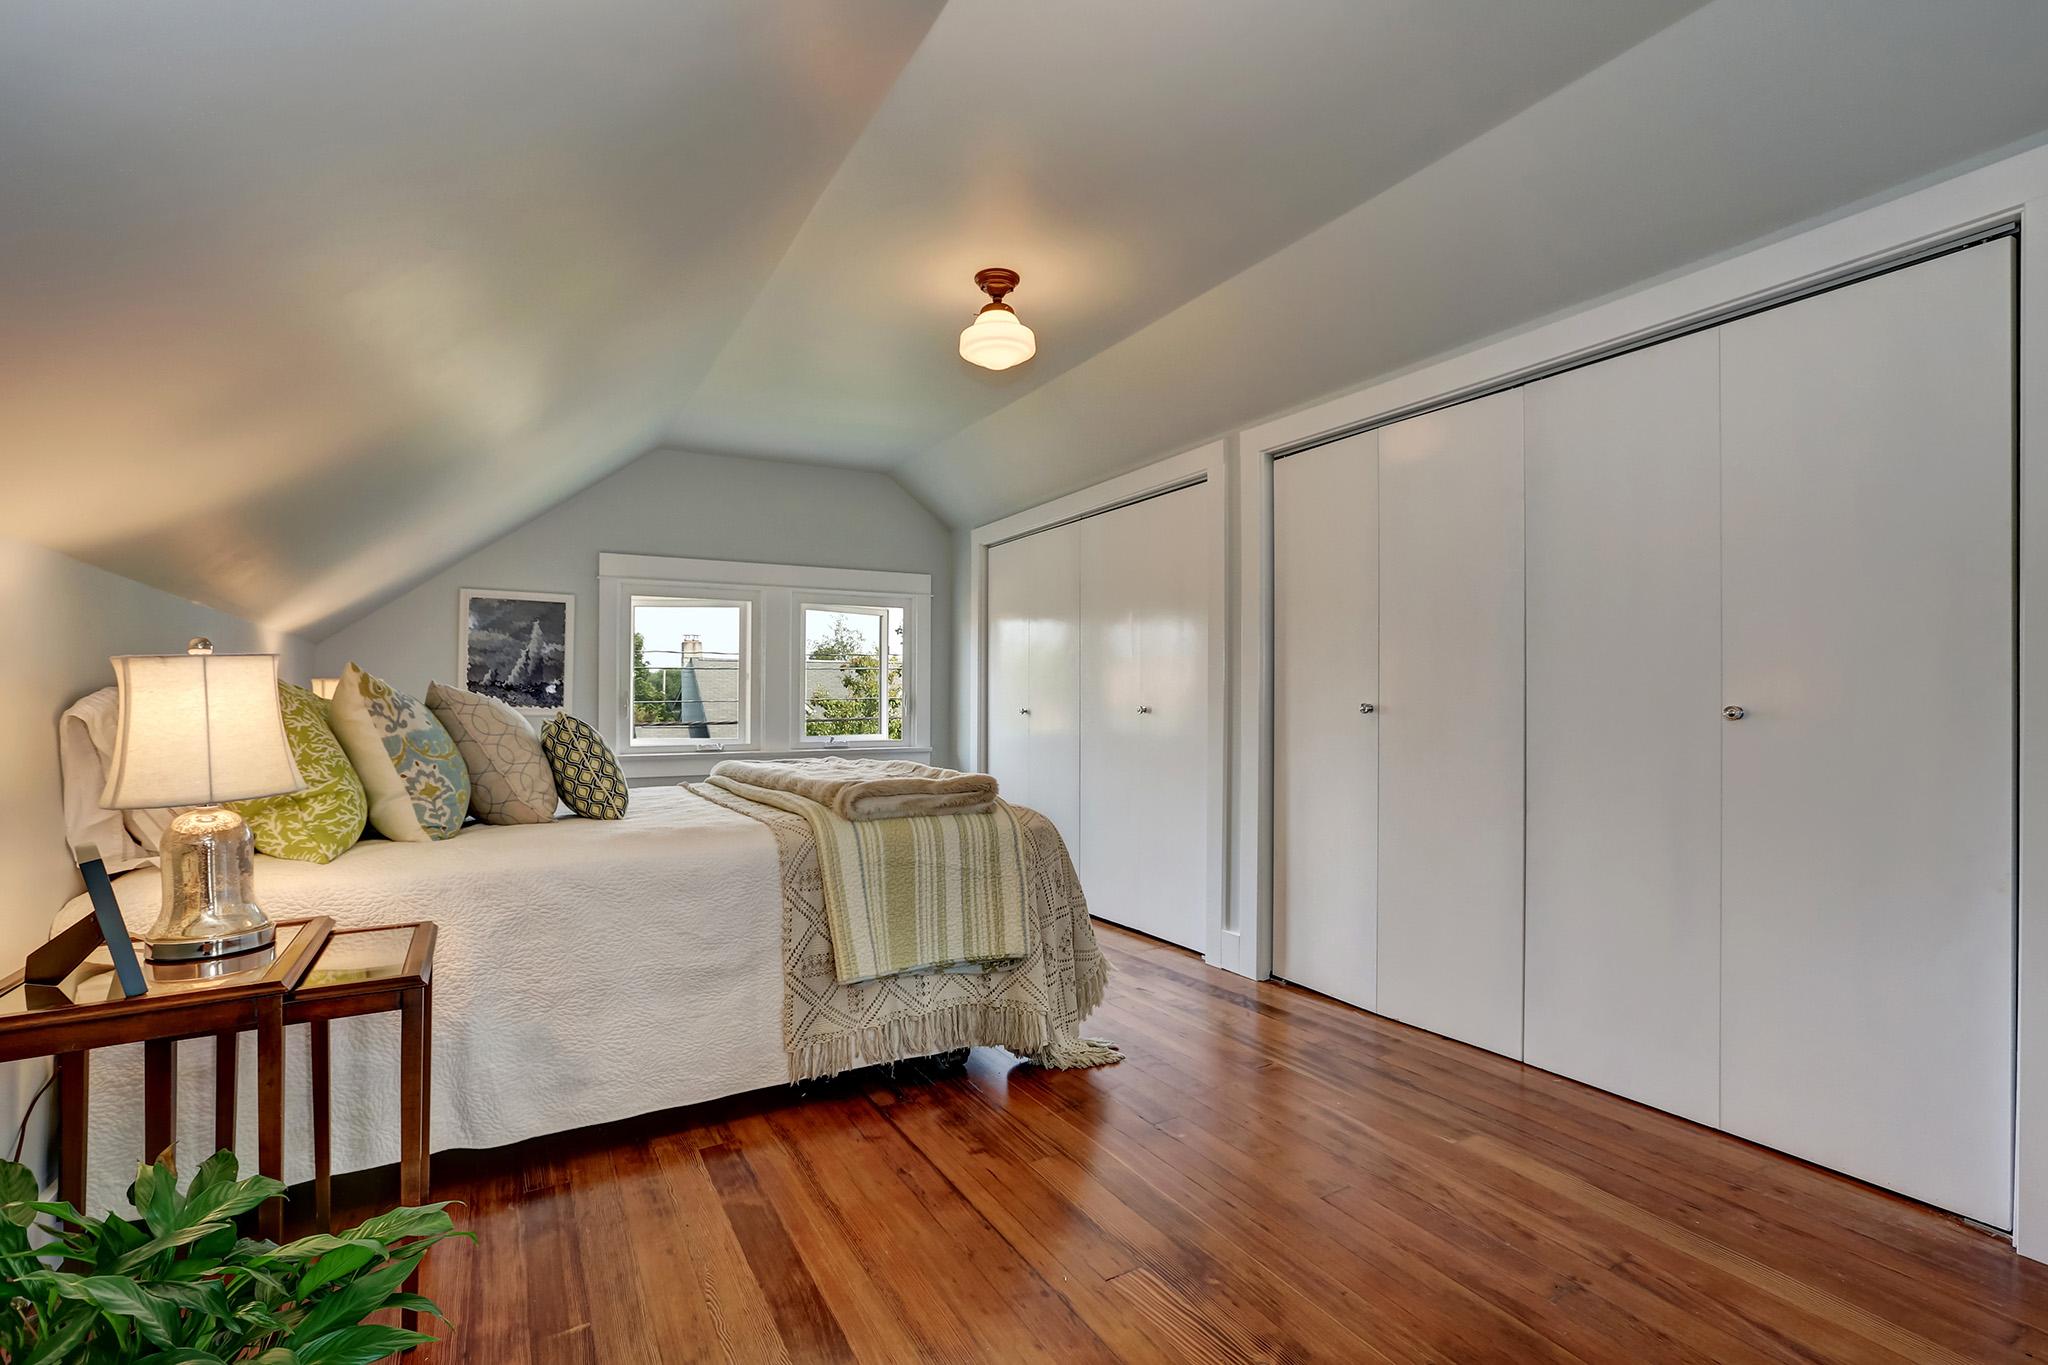 hinges wardrobe doors, built in wardrobes, angled wardrobes